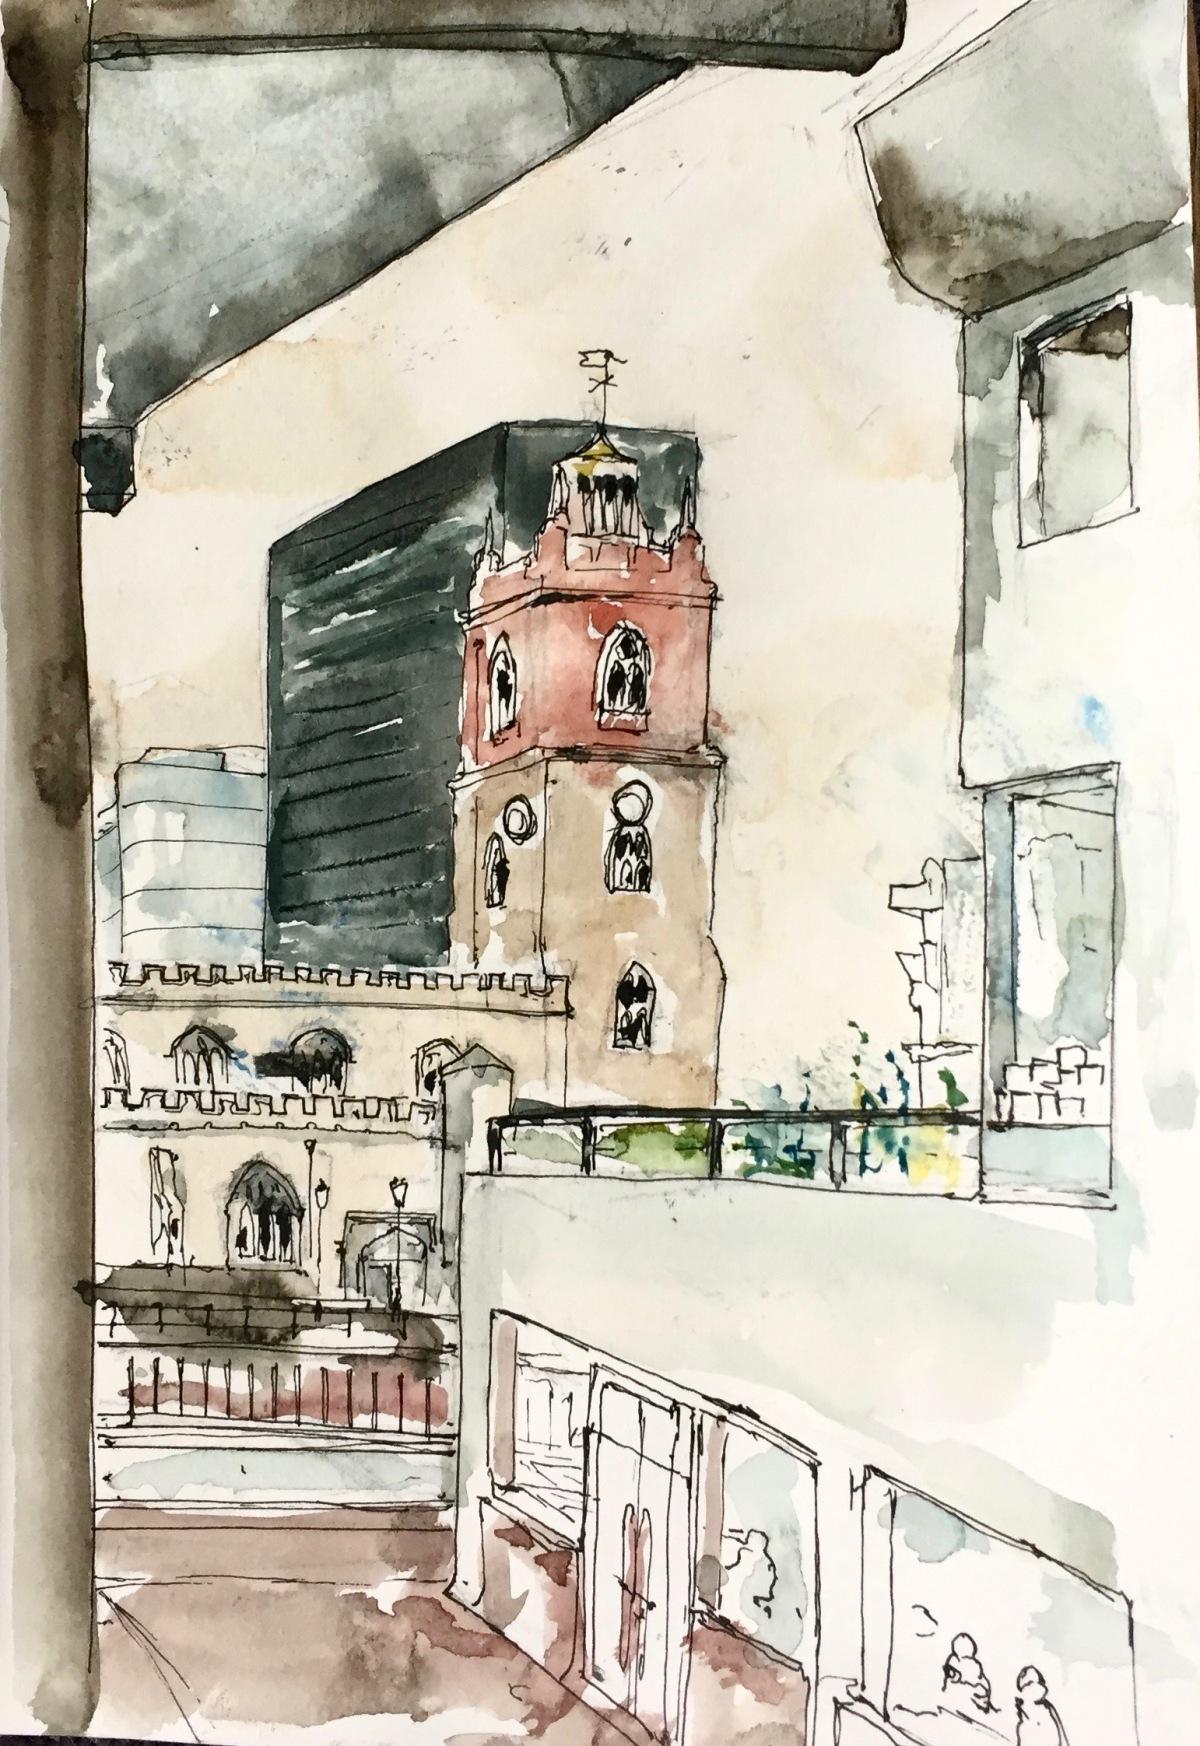 St Giles and BastionHouse